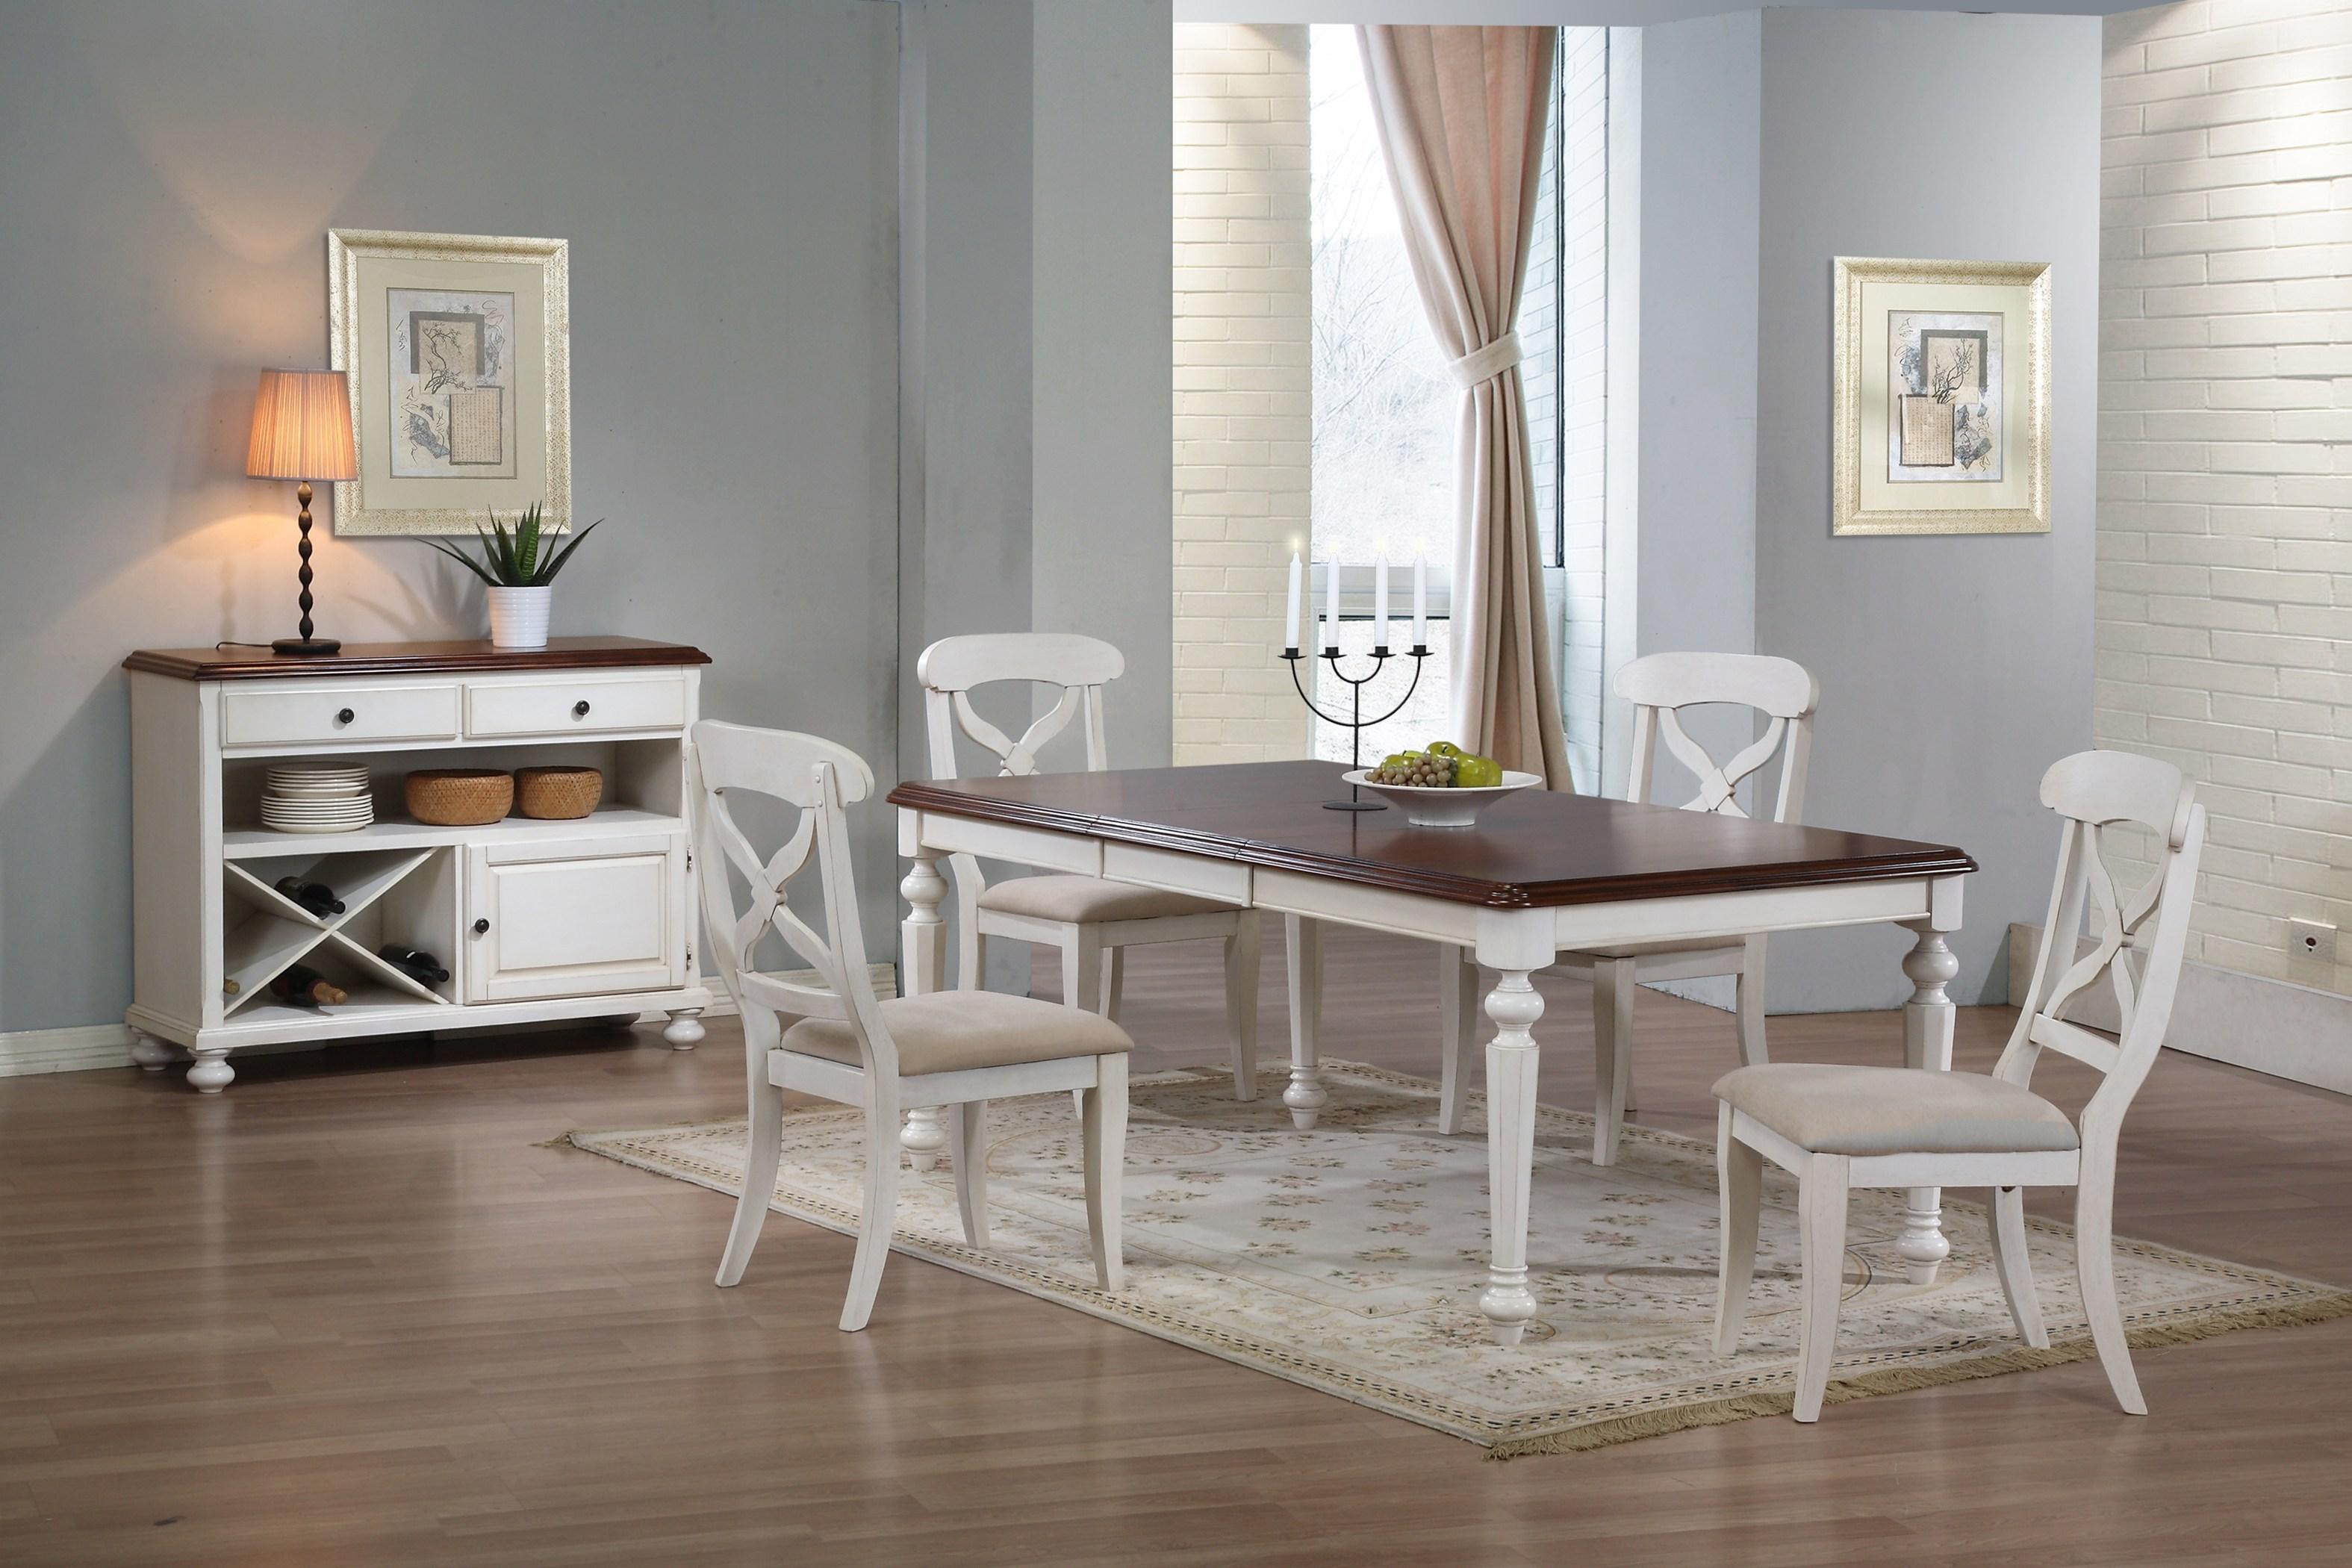 Inexpensive chic white dining table - furnitureanddecors.com/decor YSTEJPOJ